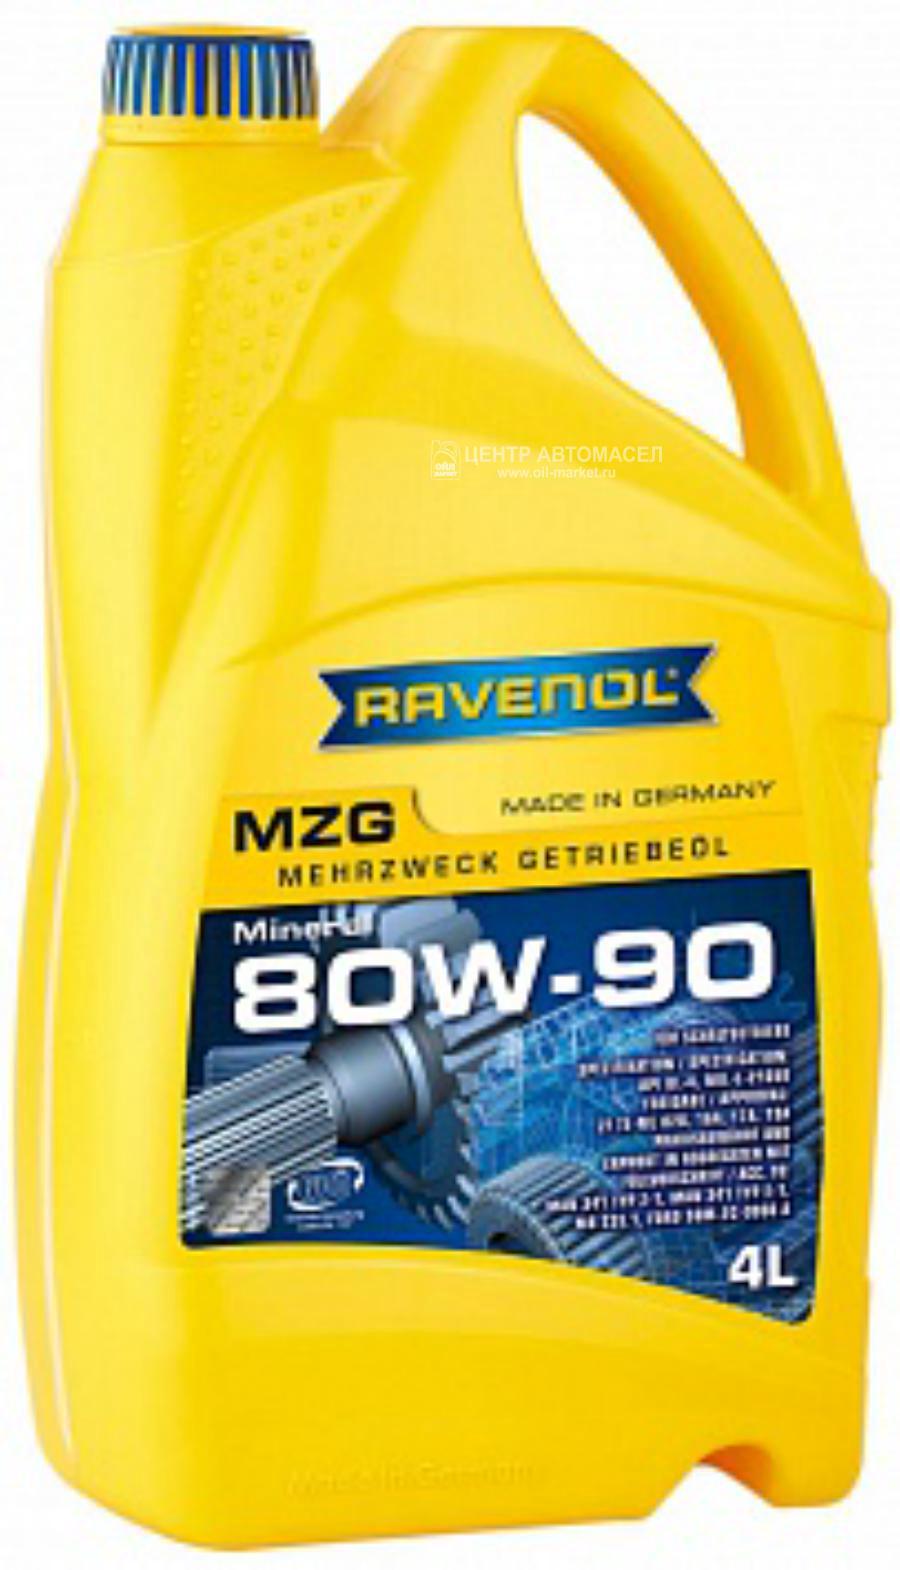 Трансмиссионное масло ravenol getriebeoel mzg sae 80w-90 gl-4 ( 4л) new